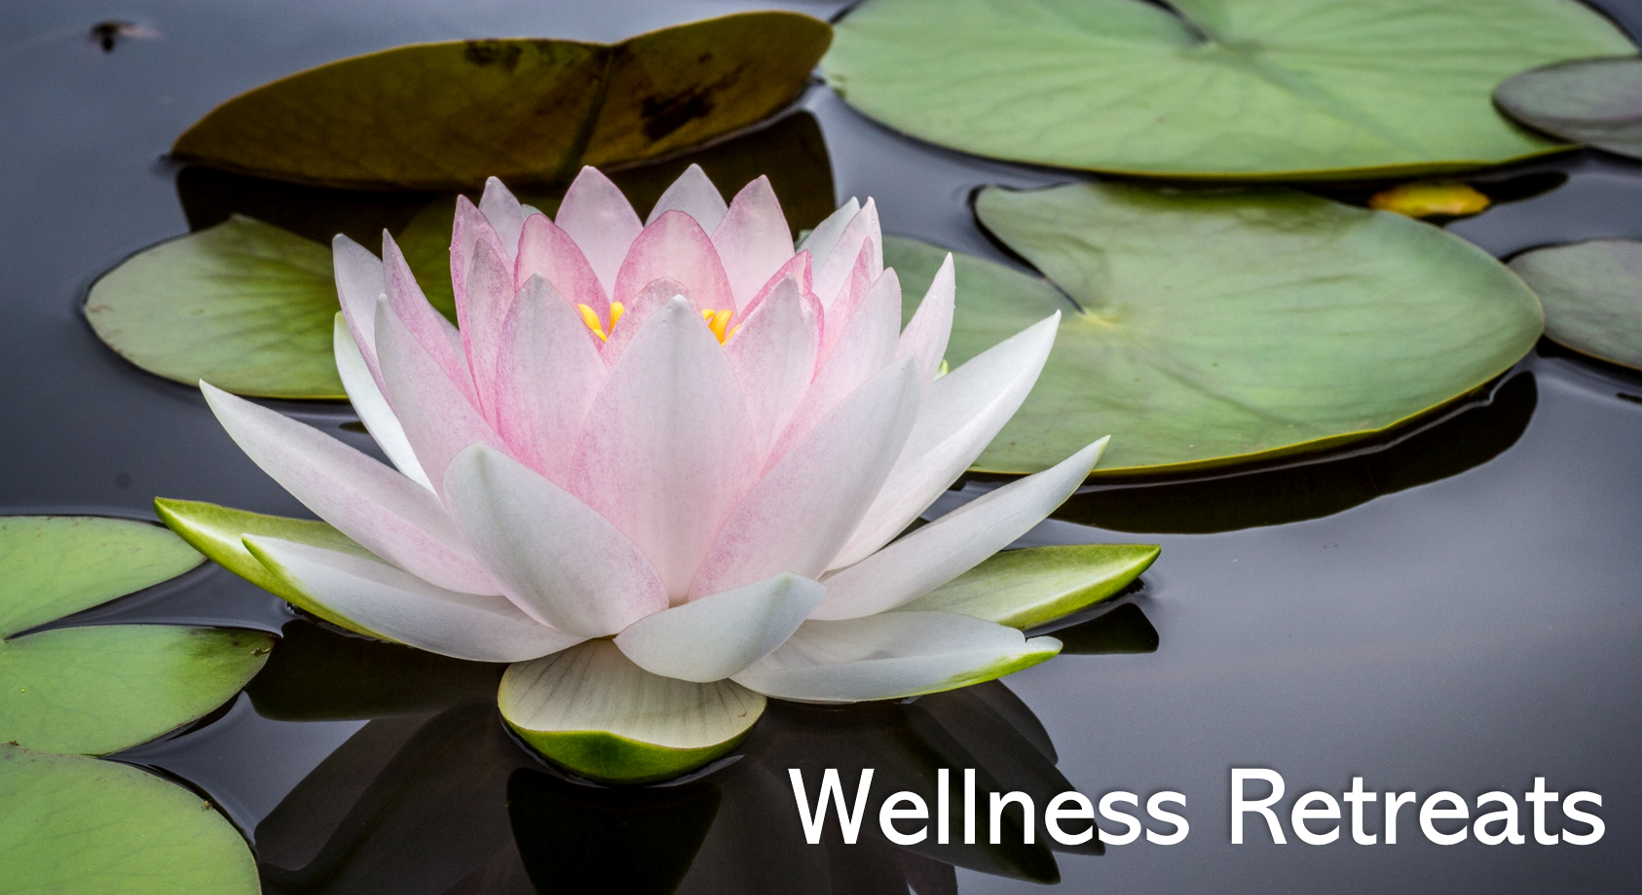 Wellness Retreats with Lani Visconti